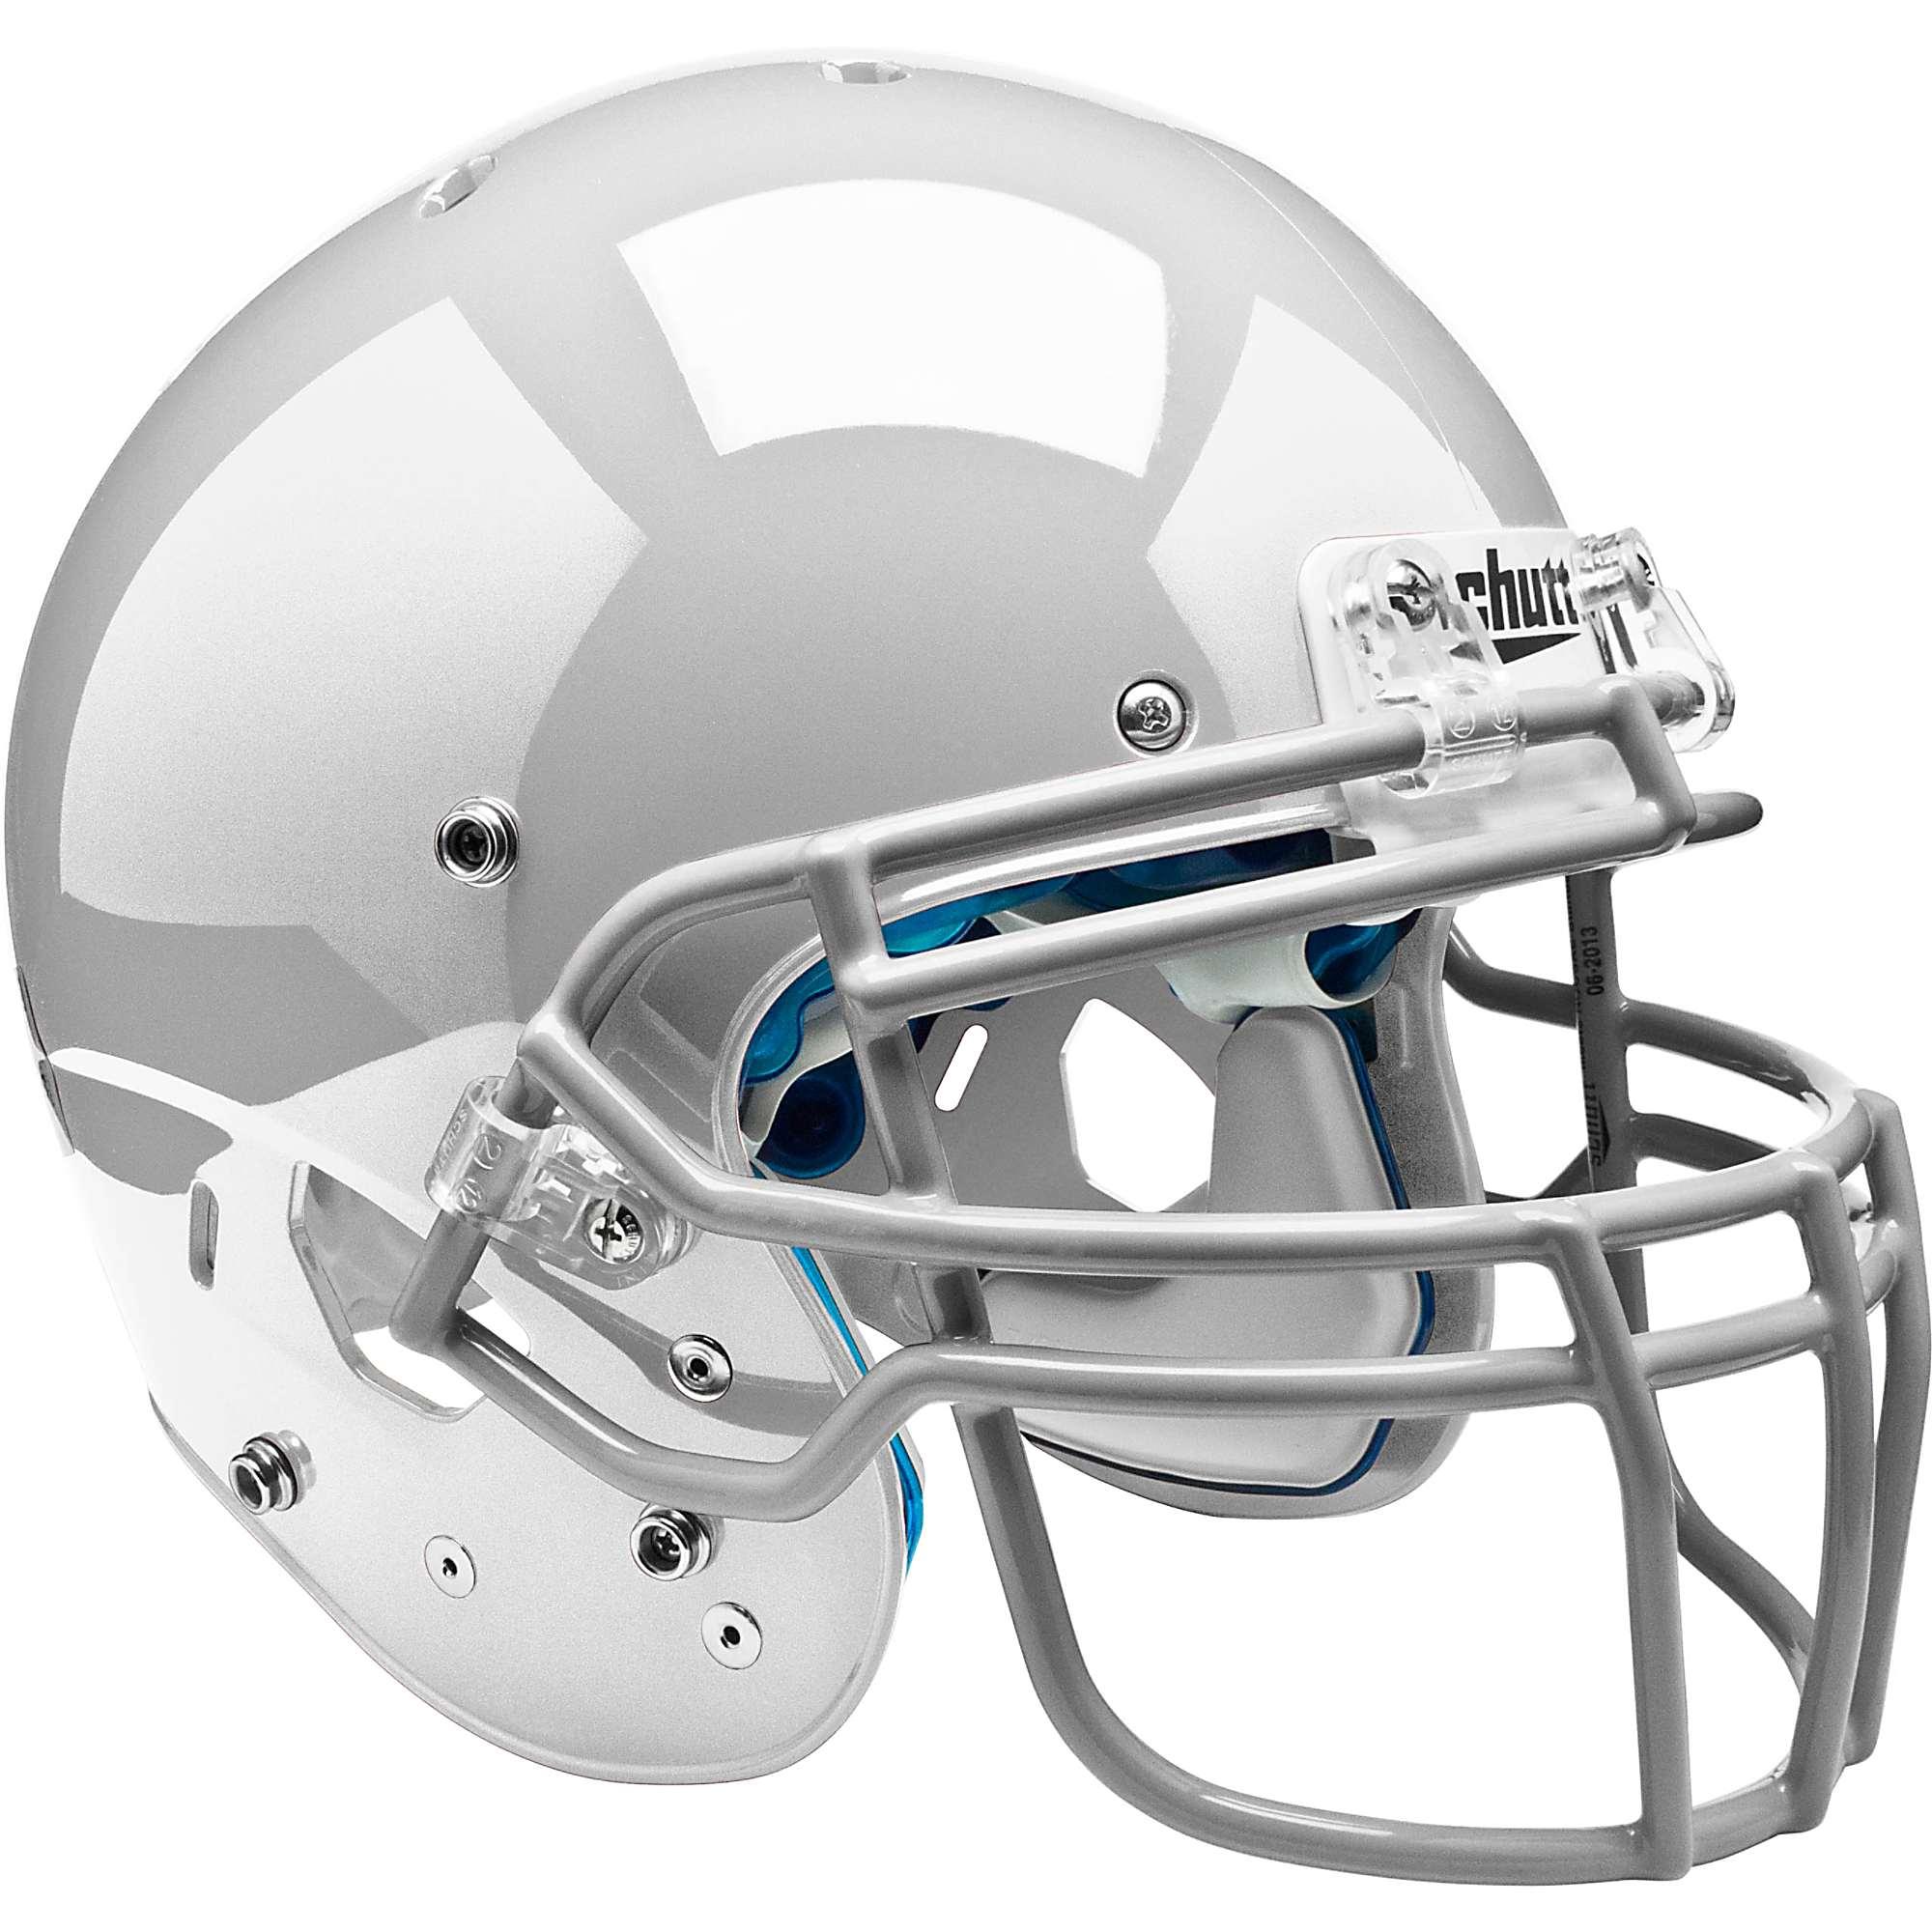 Schutt Adult 2014 Air Xp Football Helmet | eBay